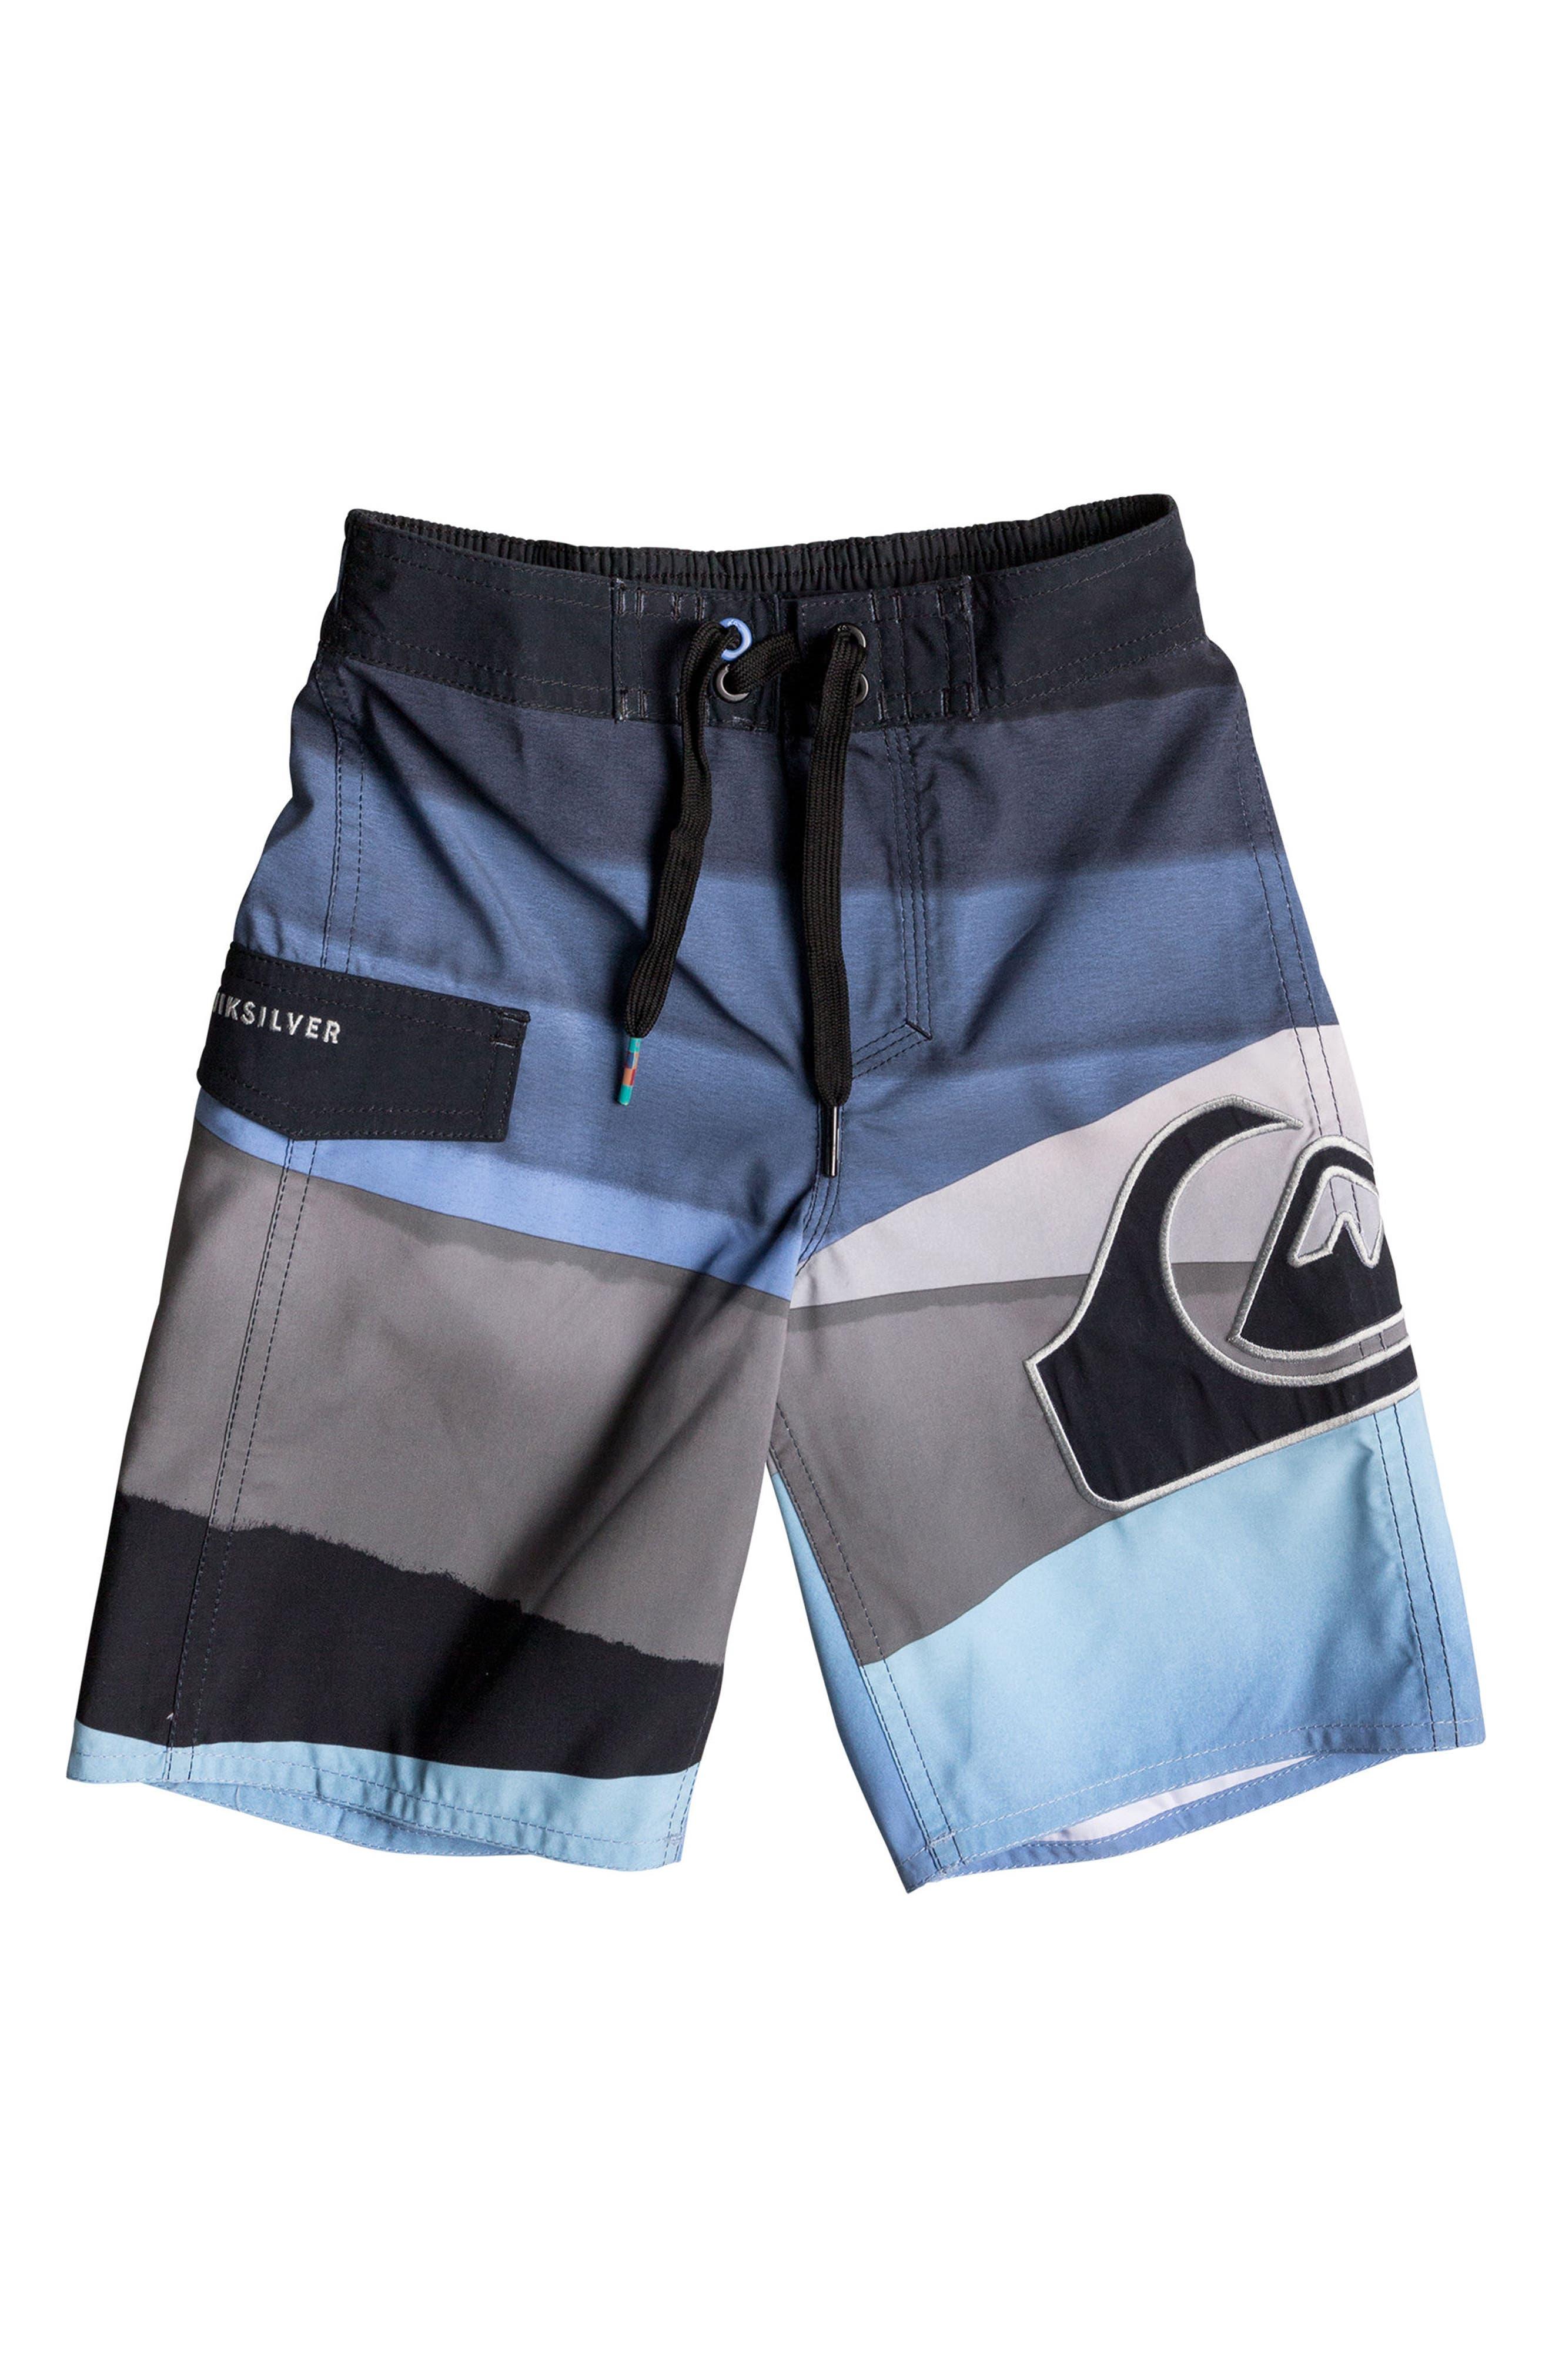 Slash Board Shorts,                             Main thumbnail 1, color,                             Regatta